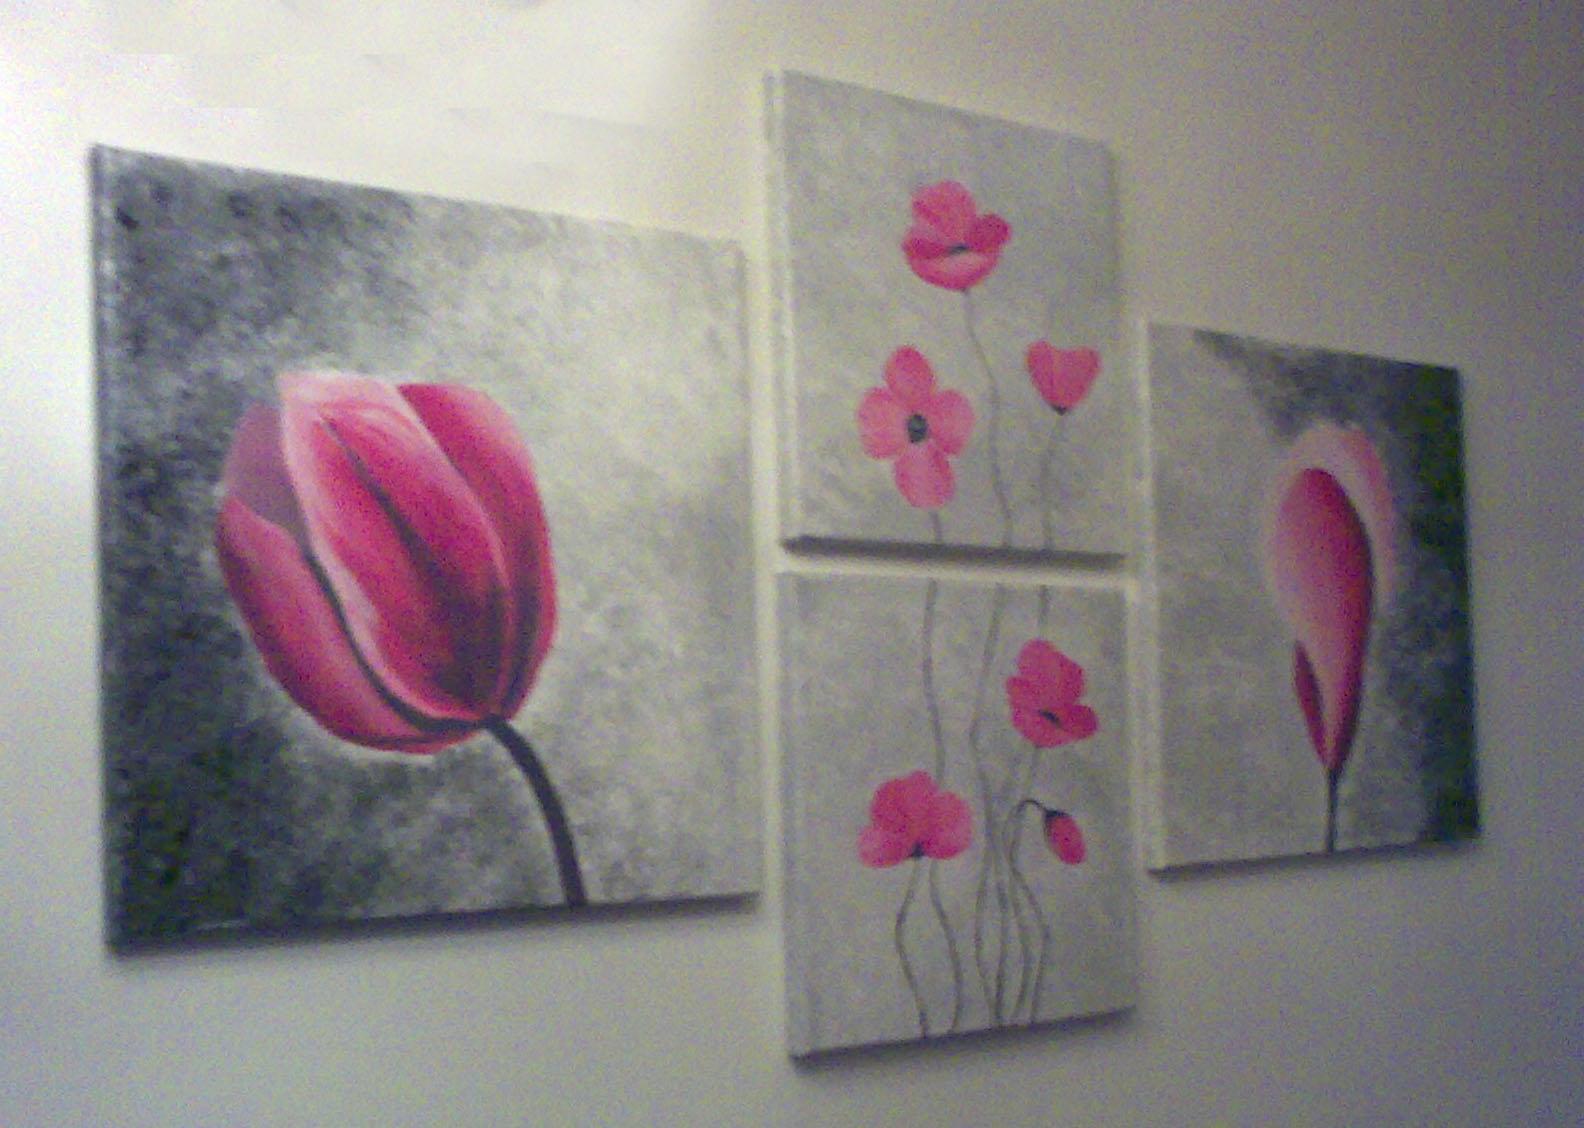 http://2.bp.blogspot.com/-Fdv6Huwz93g/T1YluWfJi4I/AAAAAAAAAUA/N3n5fcMFOWc/s1600/conjunto+de+3+flores.jpg